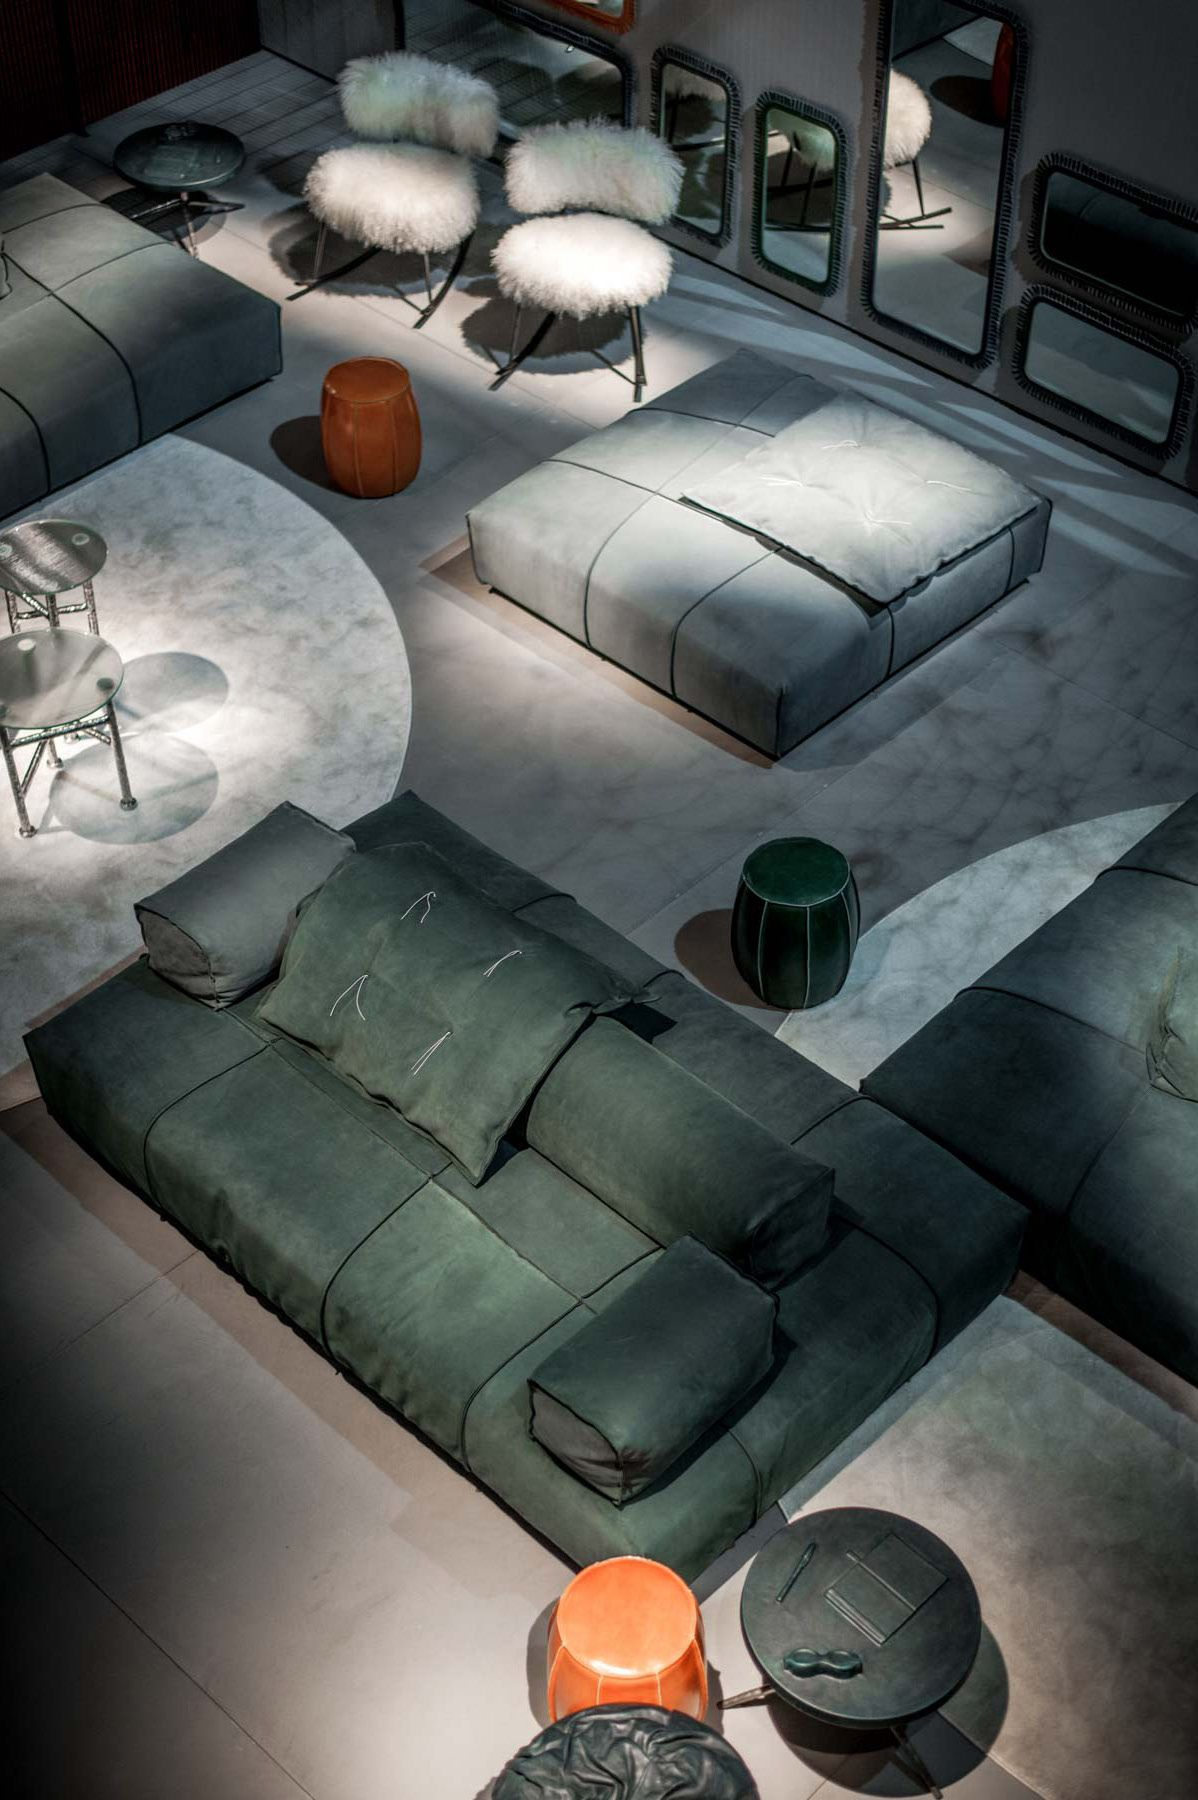 baxter panama bold pompei nepal dakar bongo gurgaon furniture